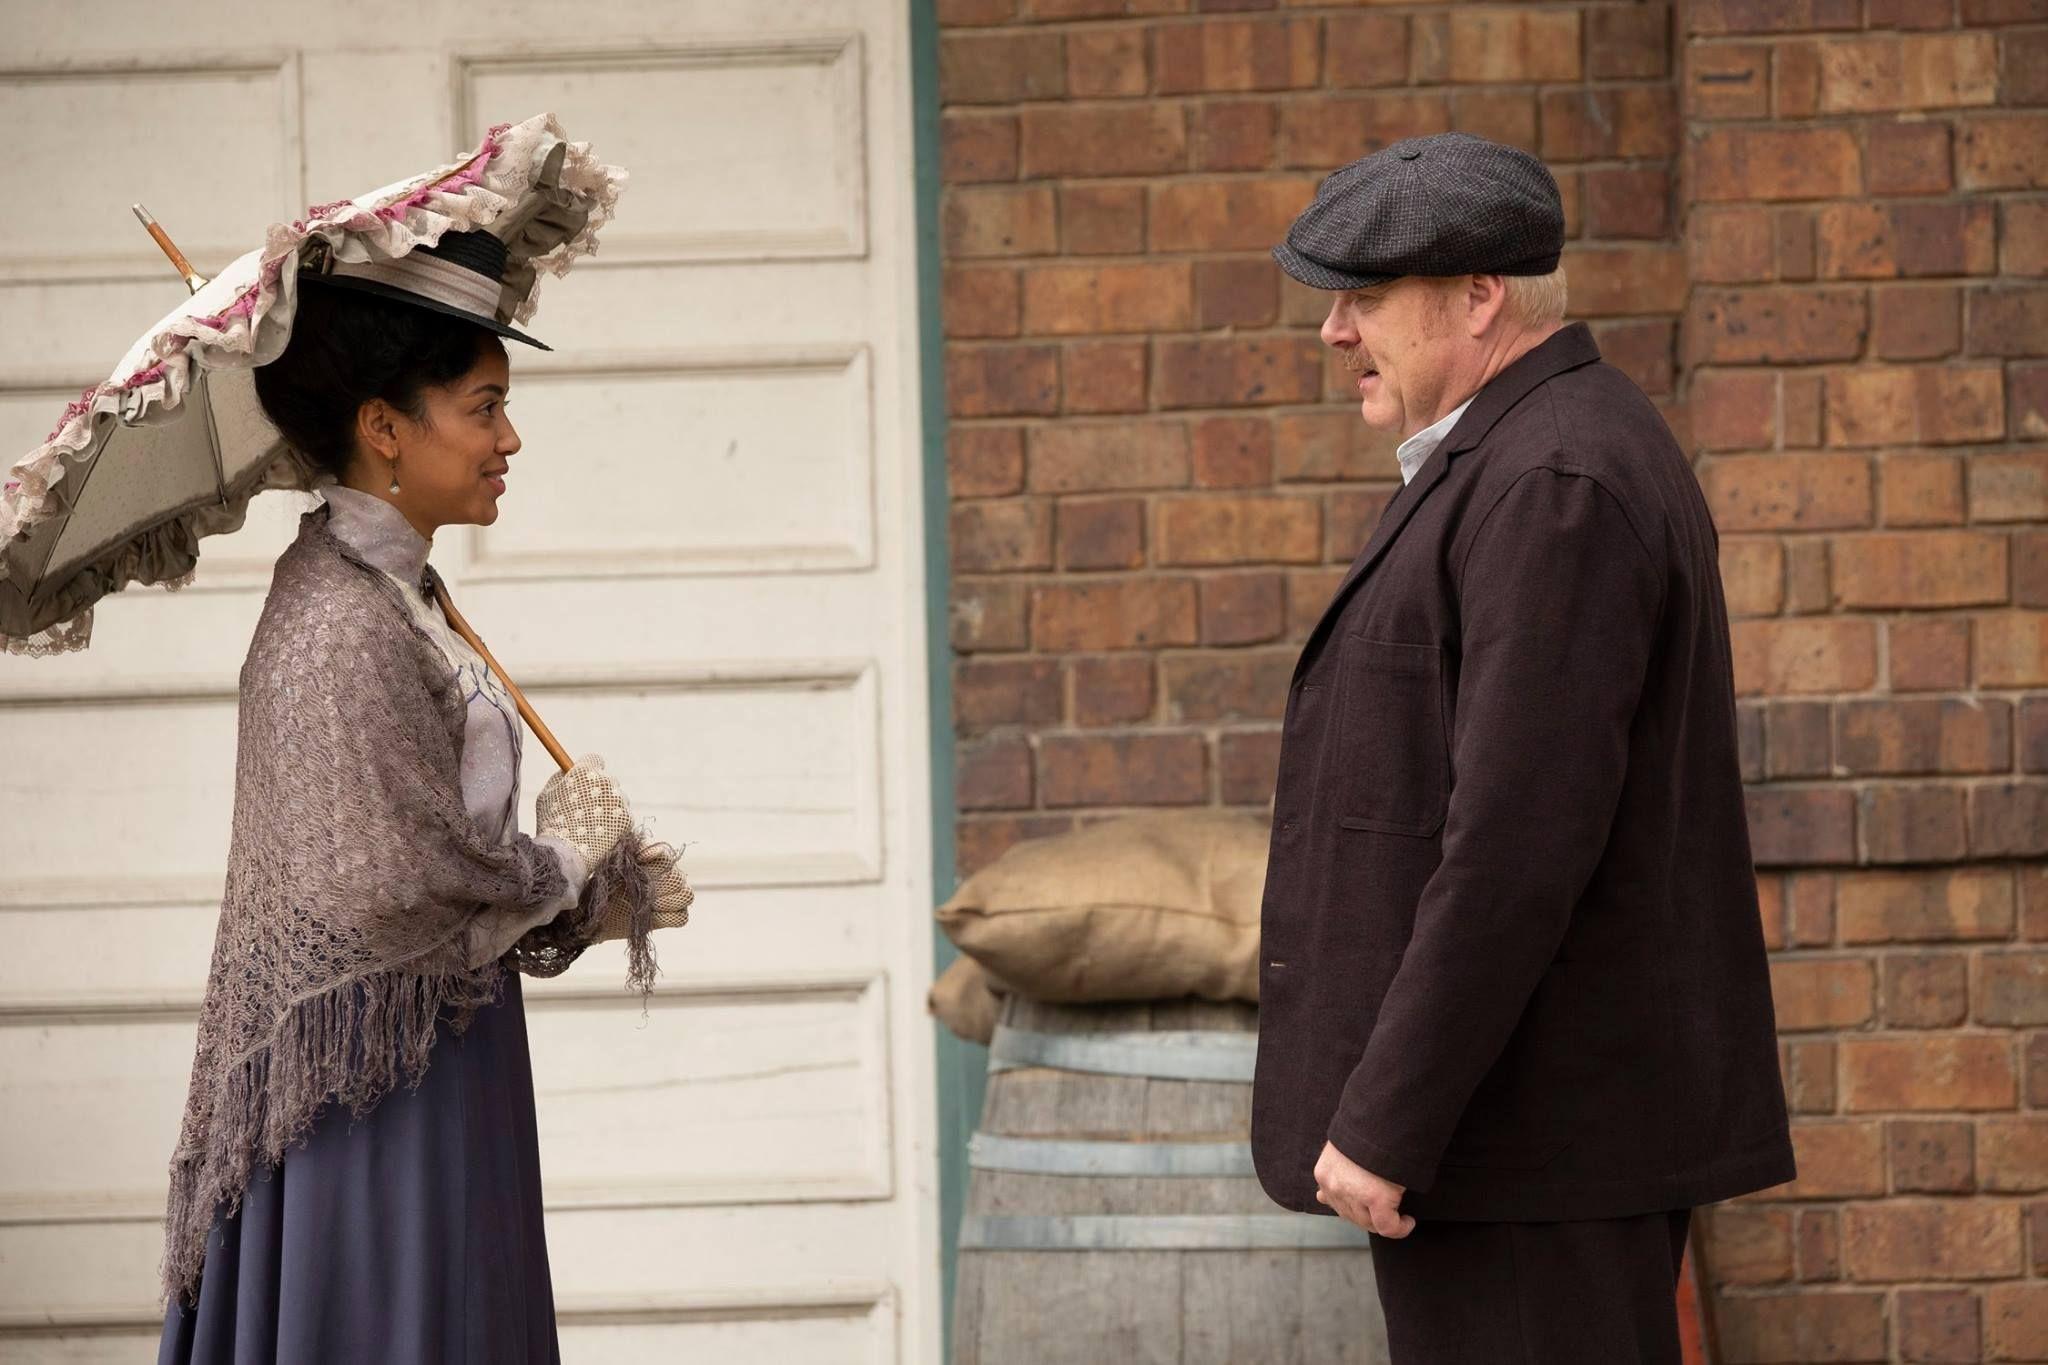 Thomas Craig and Shailene Garnett in Murdoch Mysteries (2008)